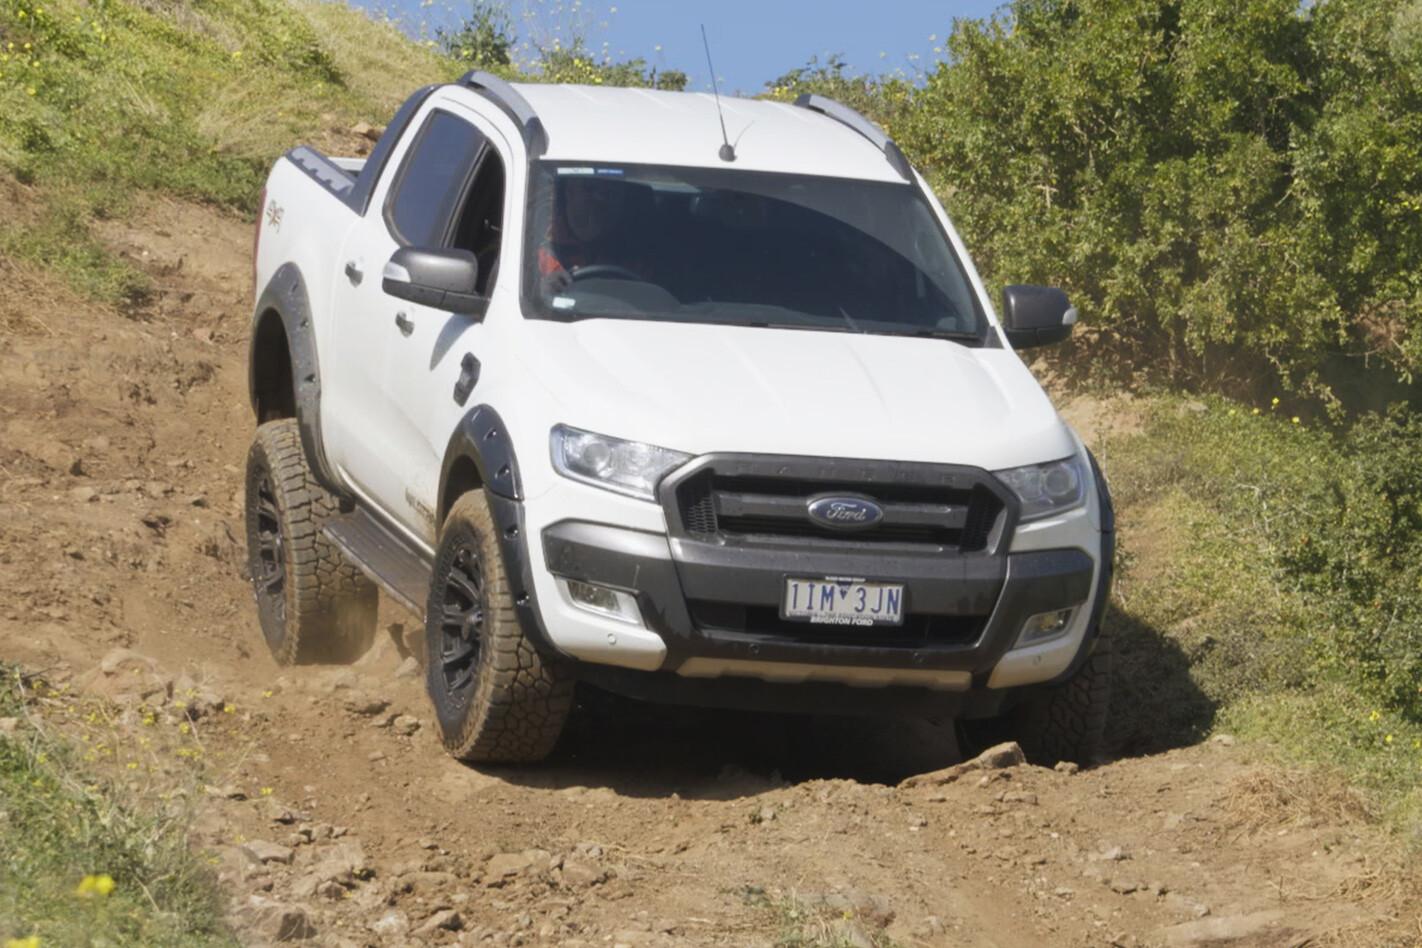 Ford Ranger with Falken Wildpeak AT3W tyres